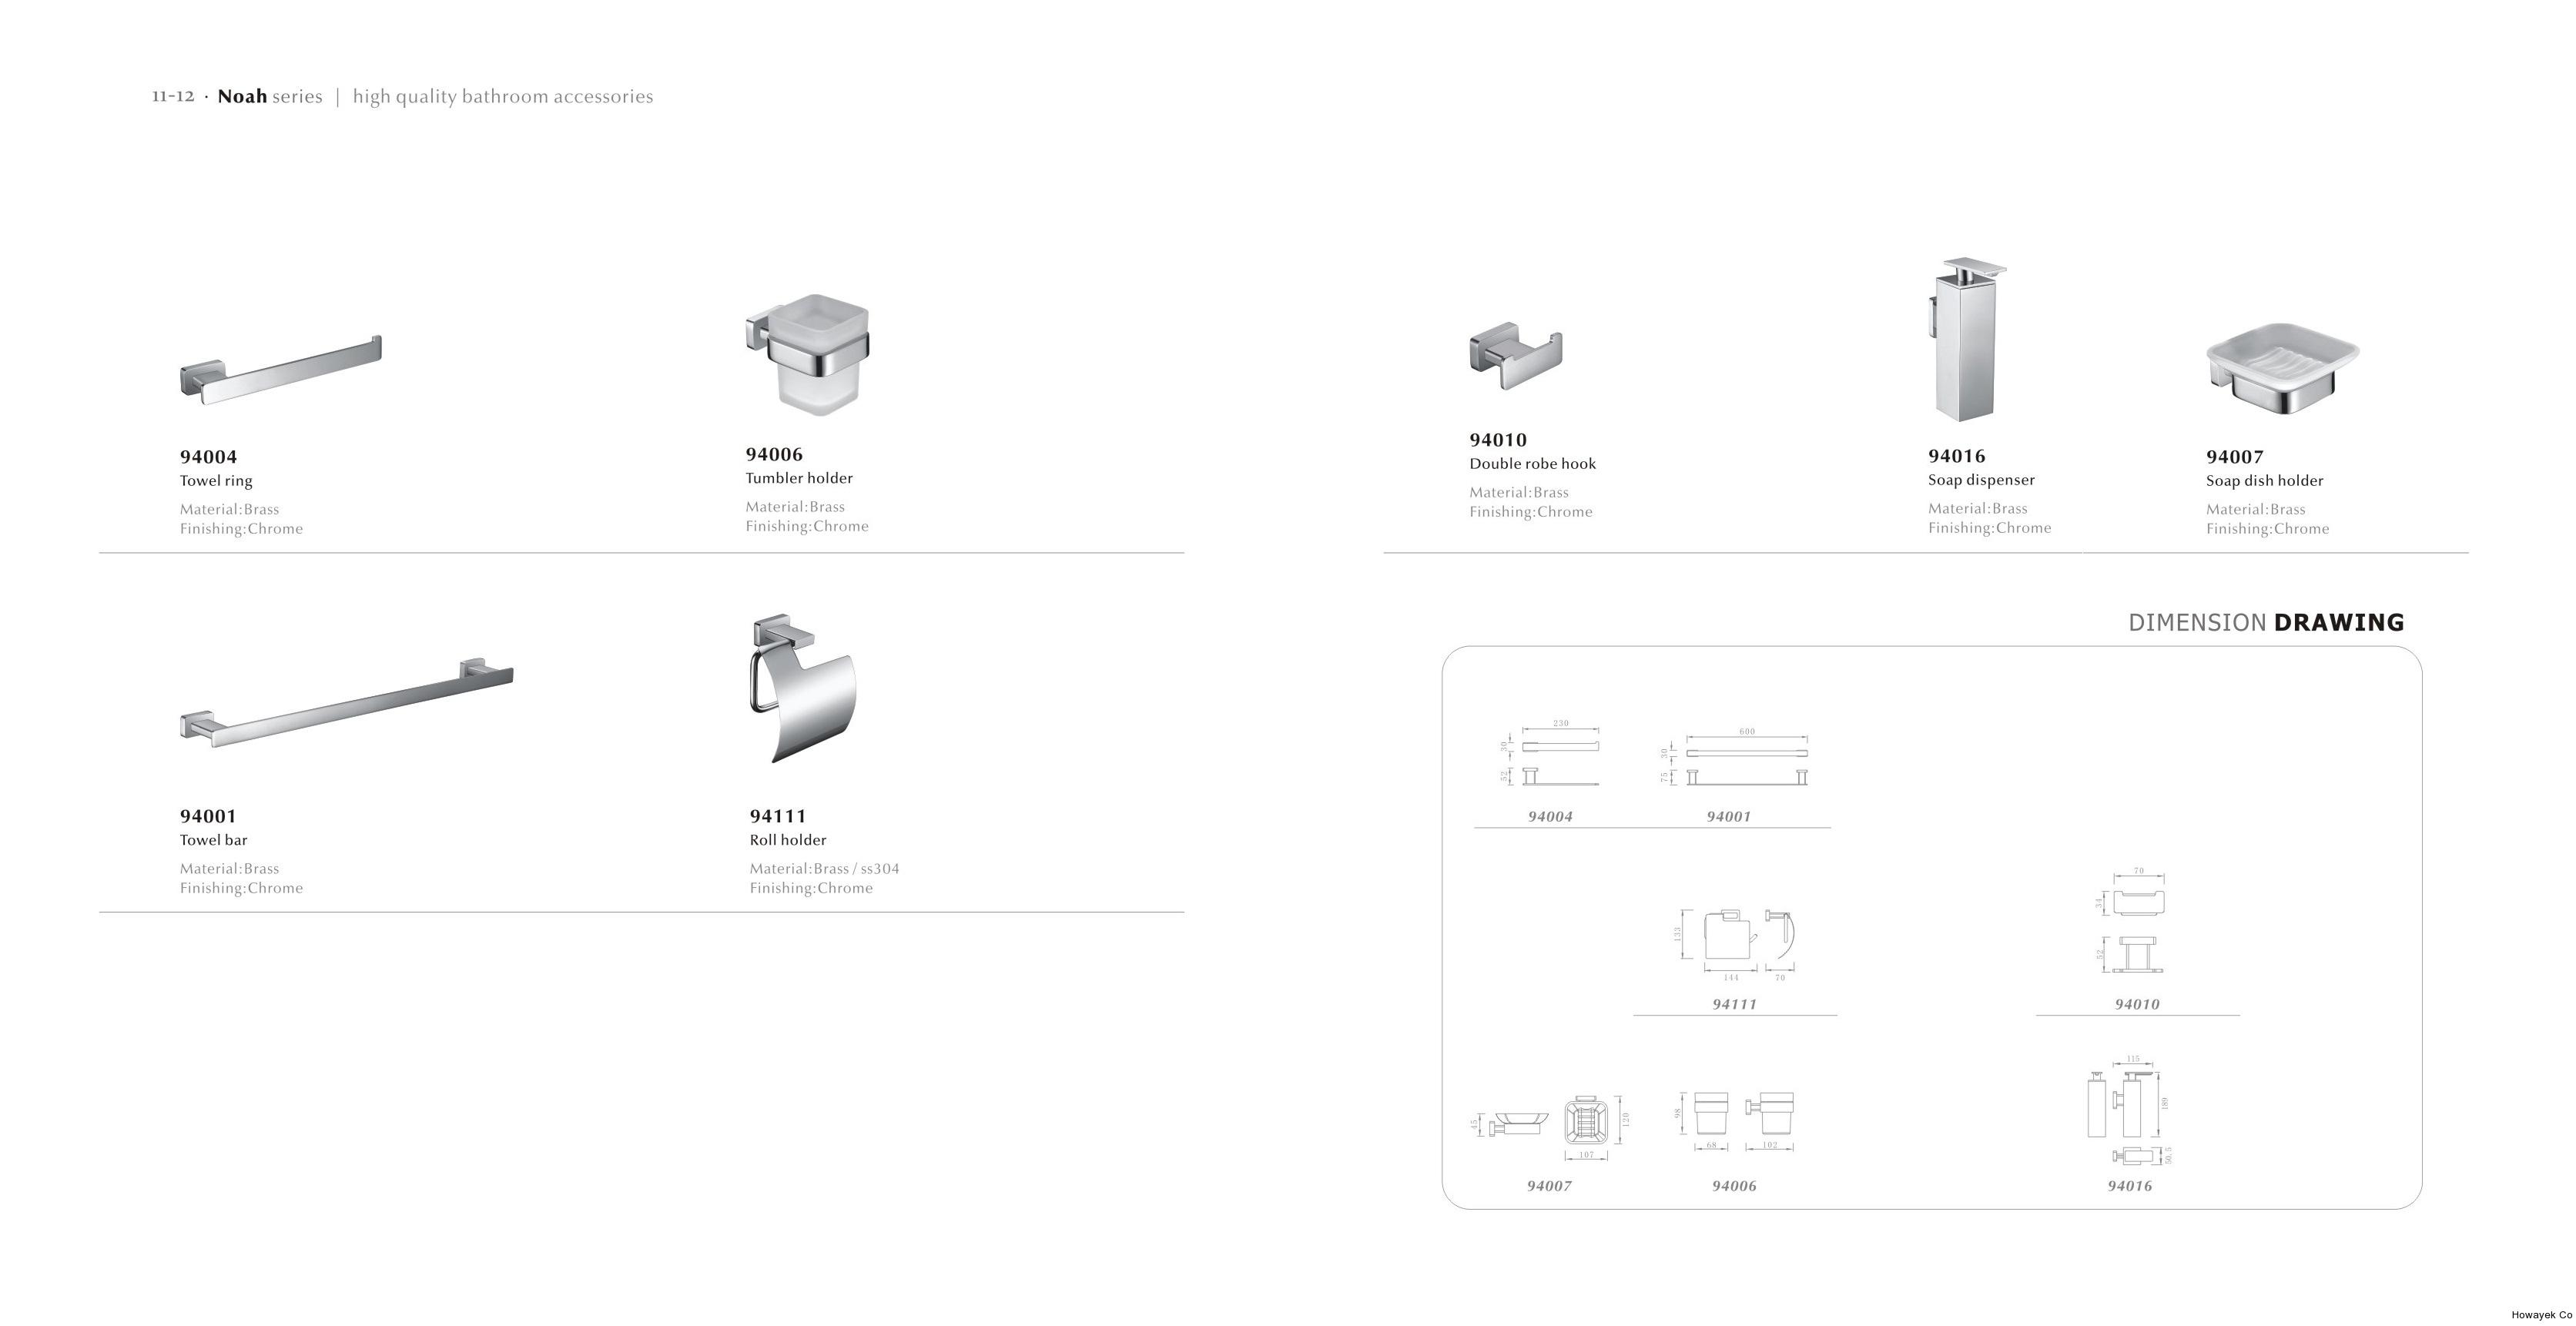 noah design